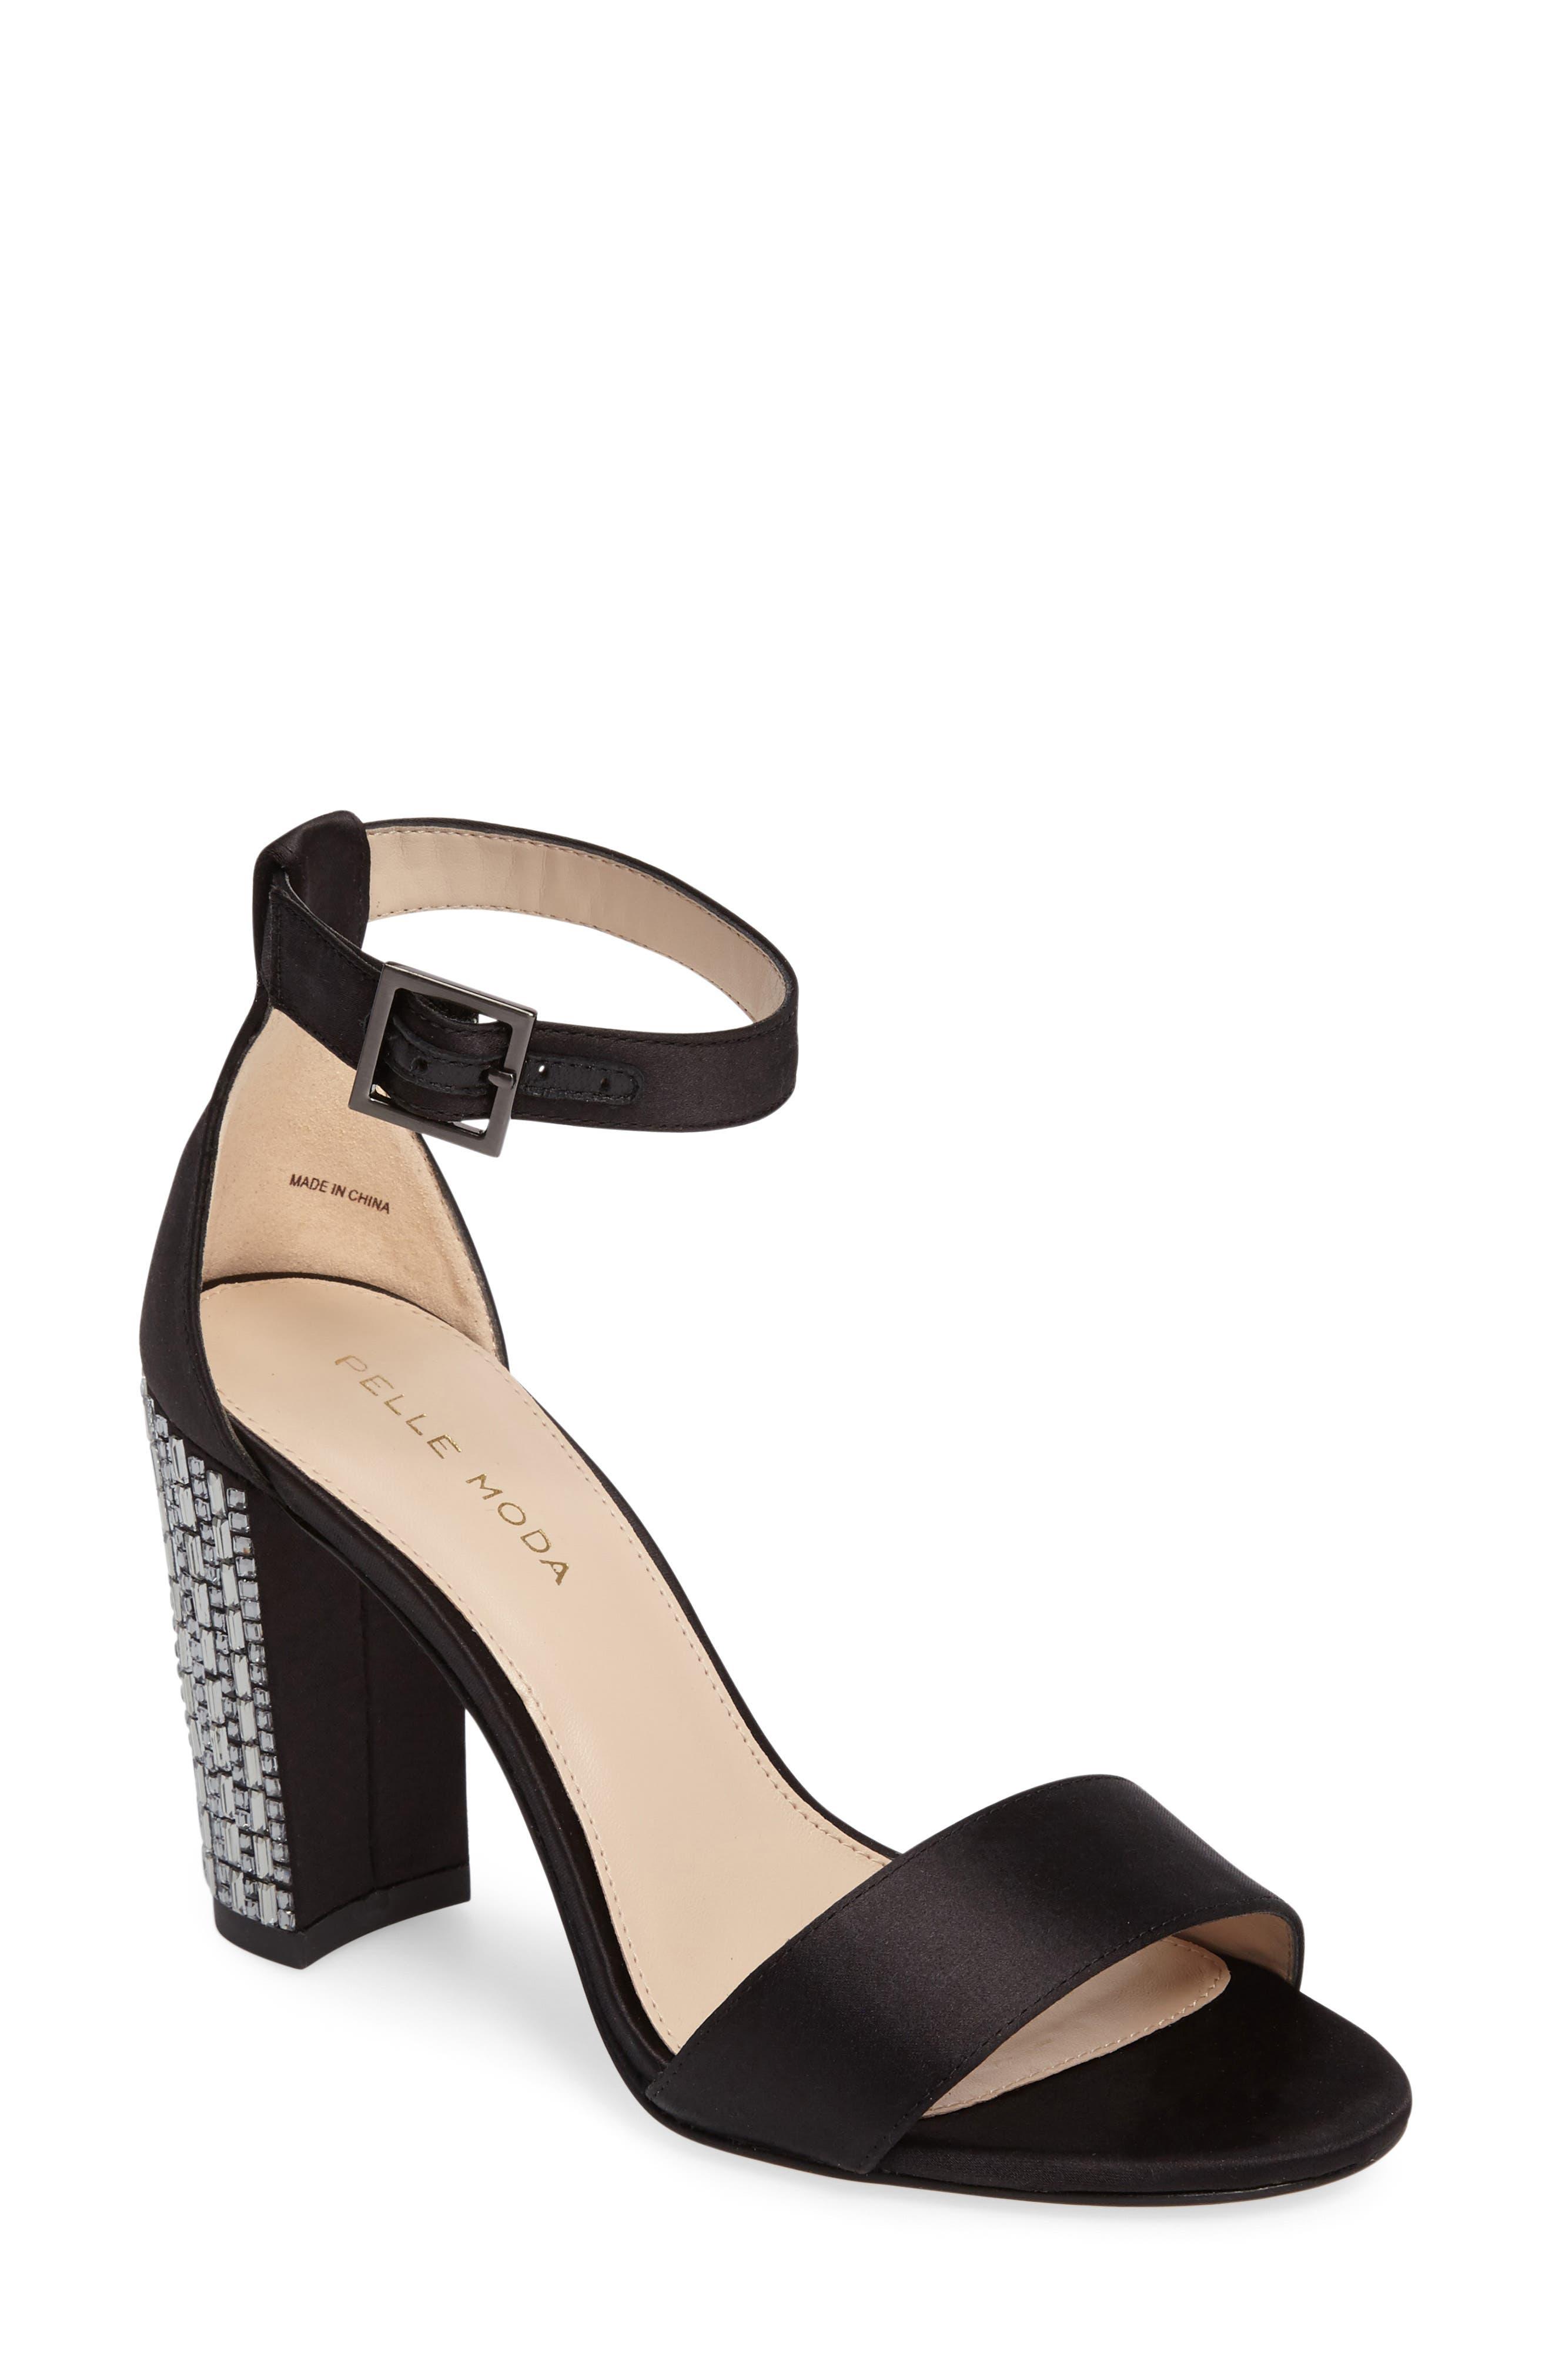 Bonnie 3 Embellished Ankle Strap Sandal,                             Main thumbnail 1, color,                             001